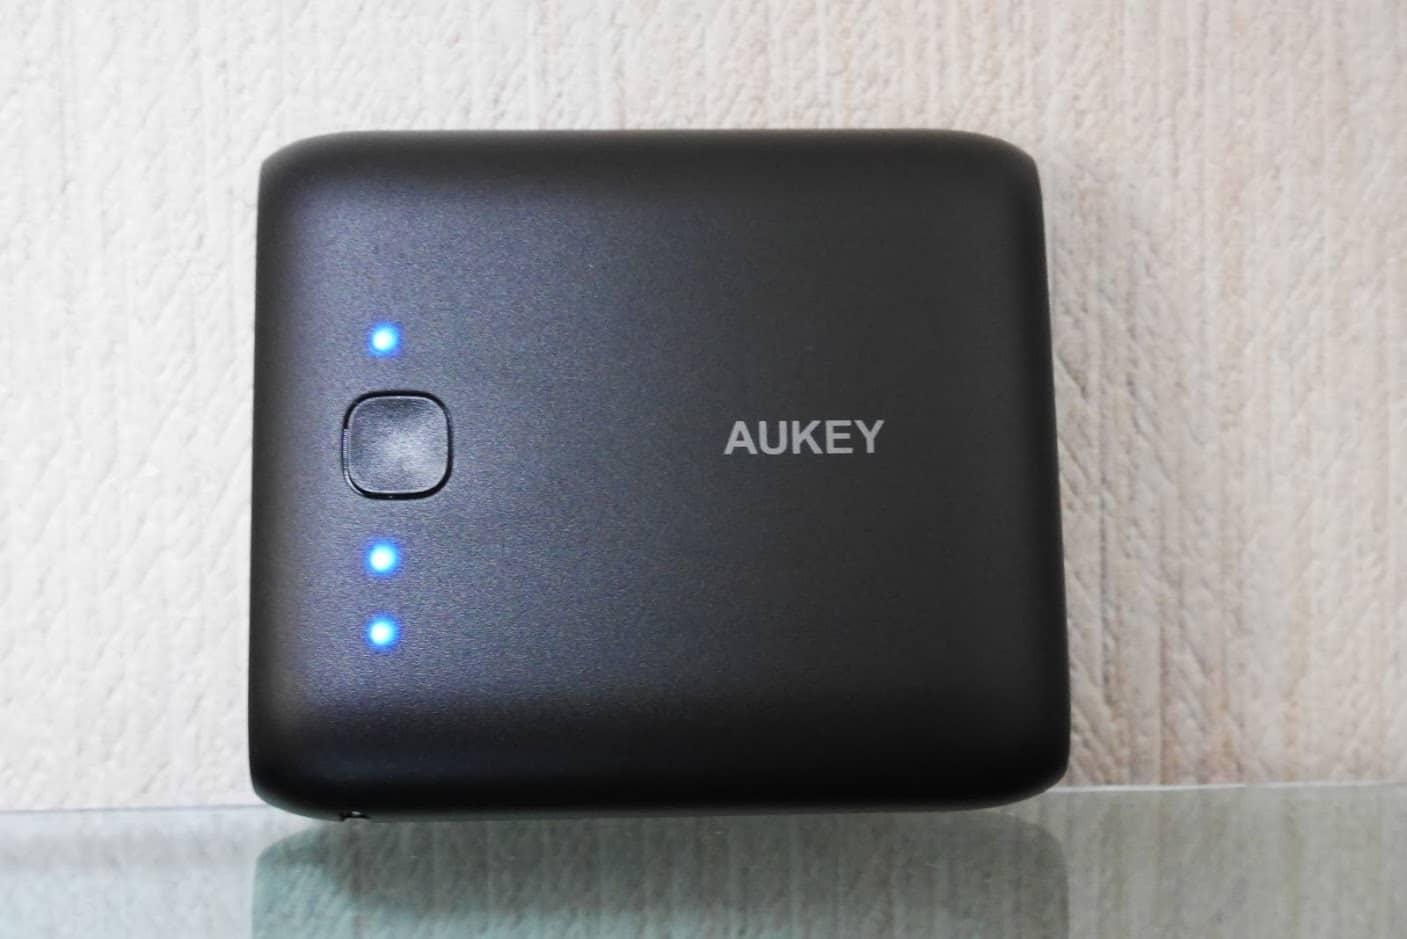 AUKEY-10,000mAh-モバイルバッテリー-PB-N42-本体